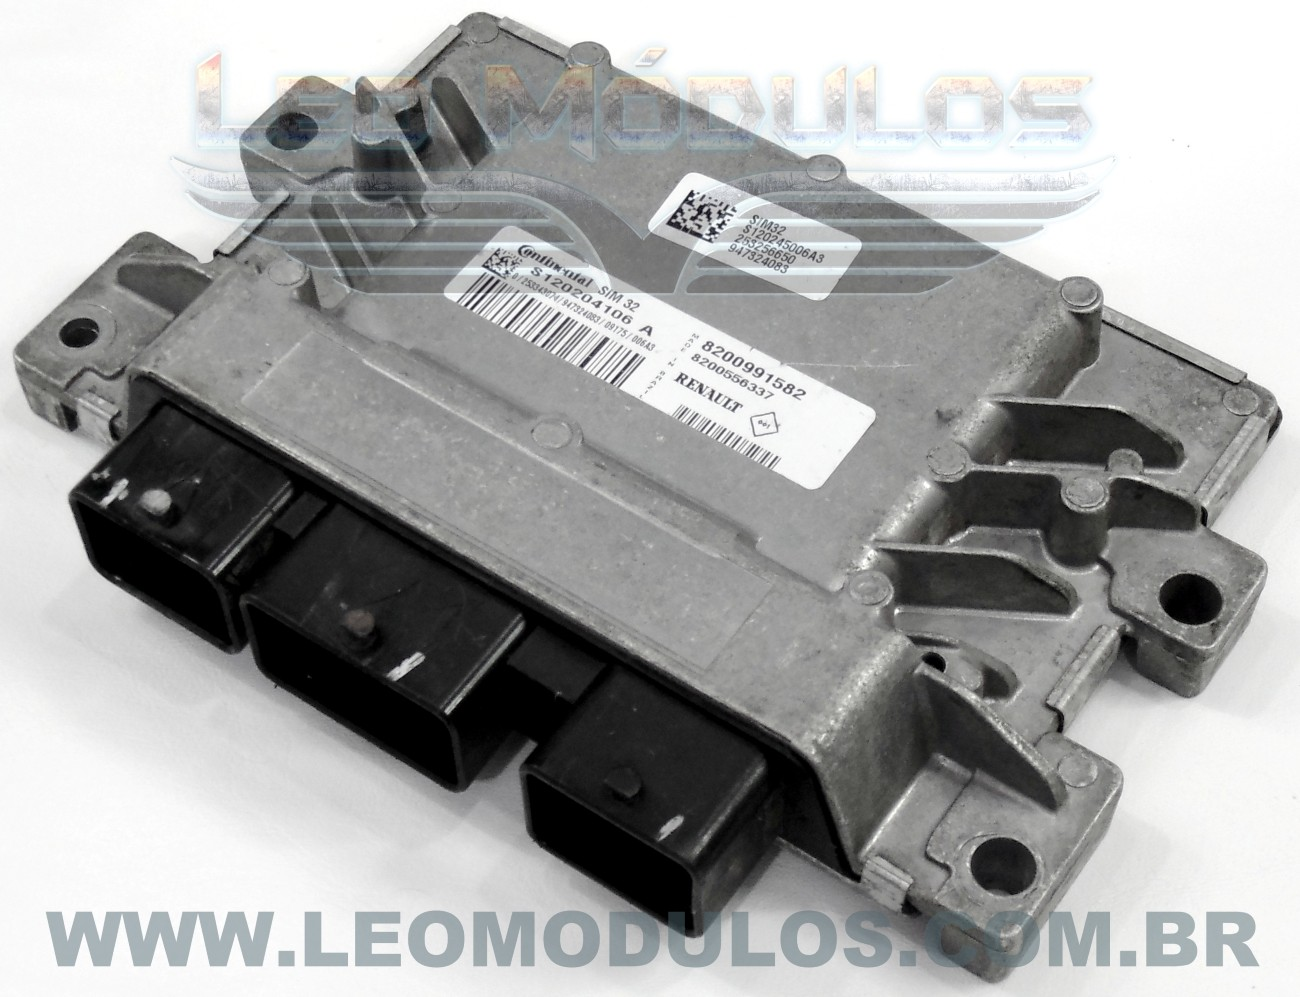 Módulo de injeção siemens SIM32 - S120204106 A 8200991582 - Renault Clio Logan 1.0 16V Flex SIM32 - Leo Módulos